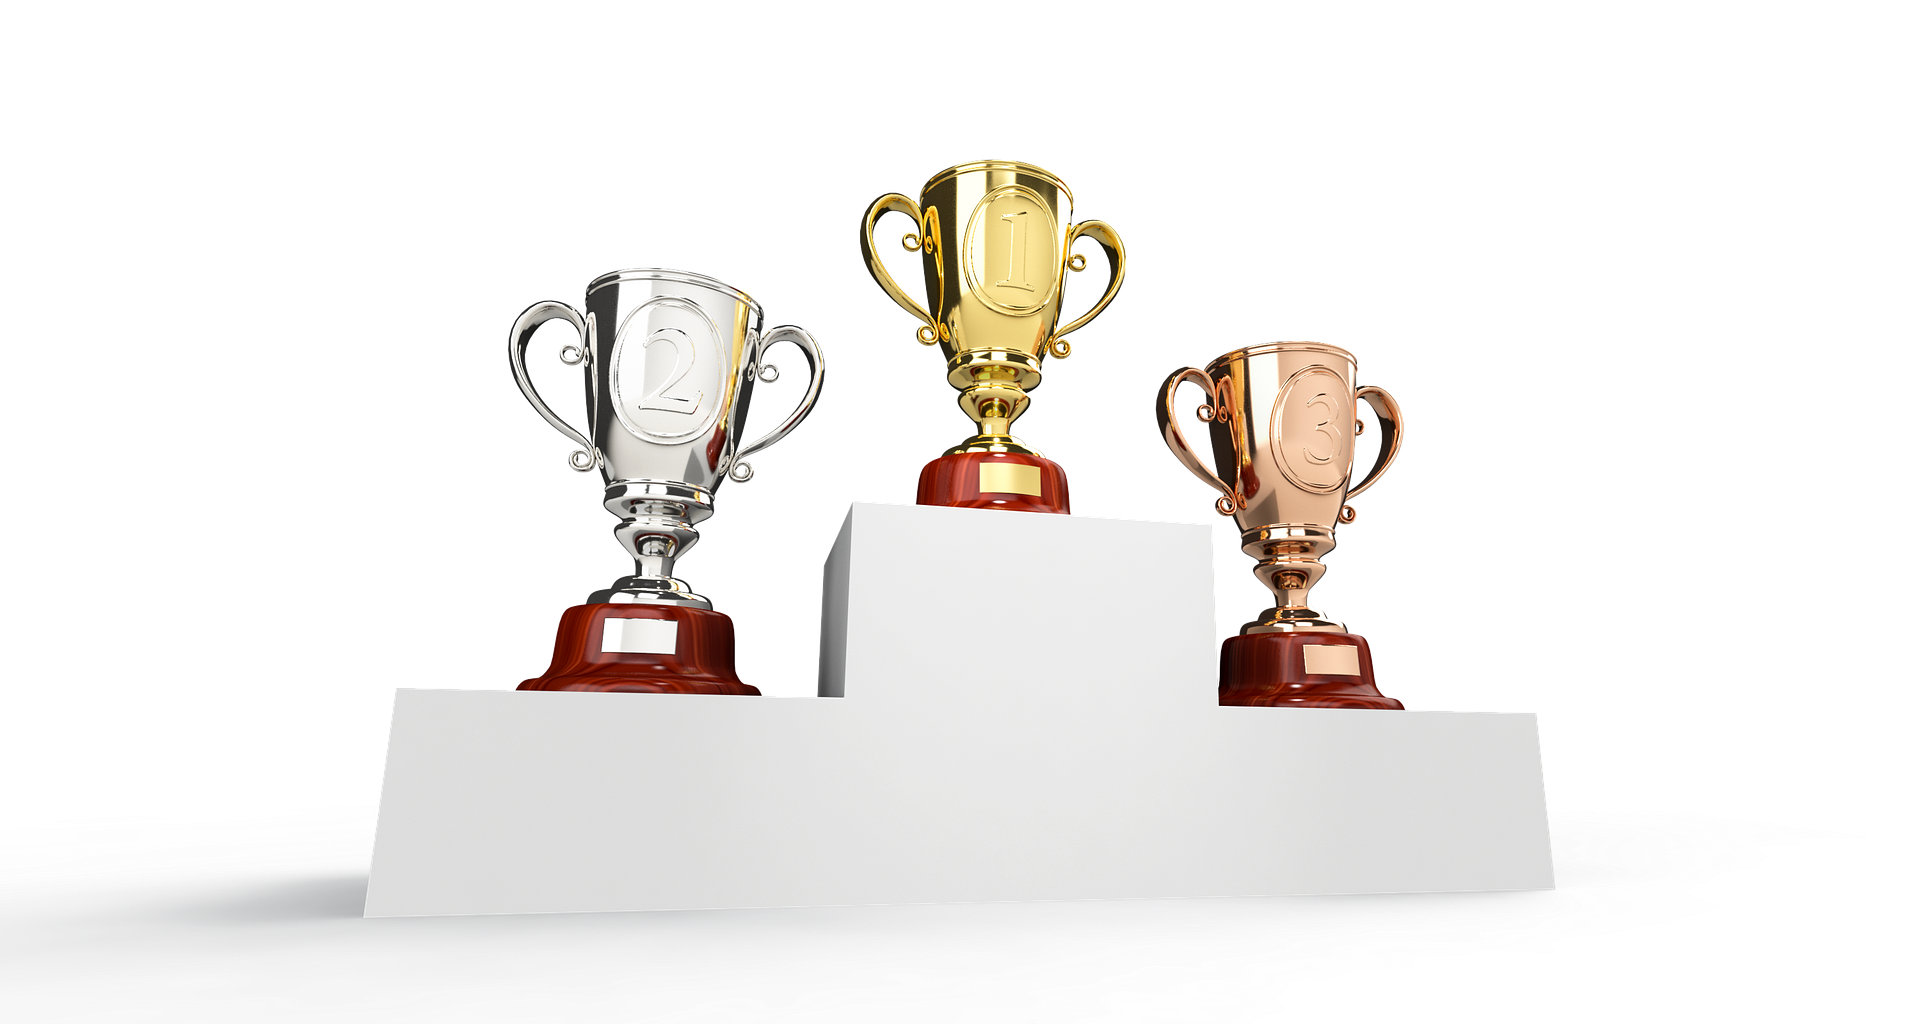 The 2021 CG Classic - Default Image of Golf Prizes Sponsor